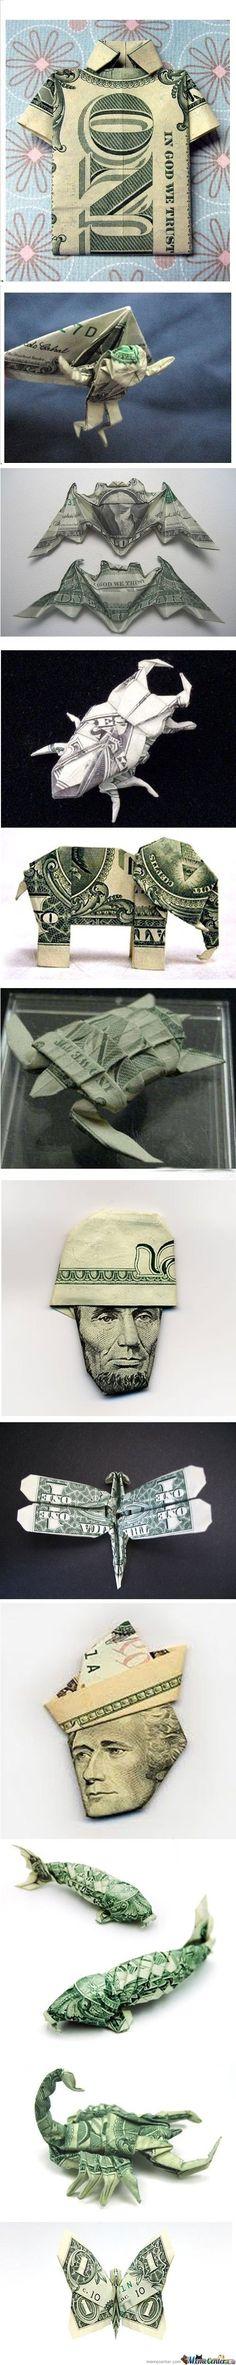 How to fold money - DIY Money ORIGAMI tutorials